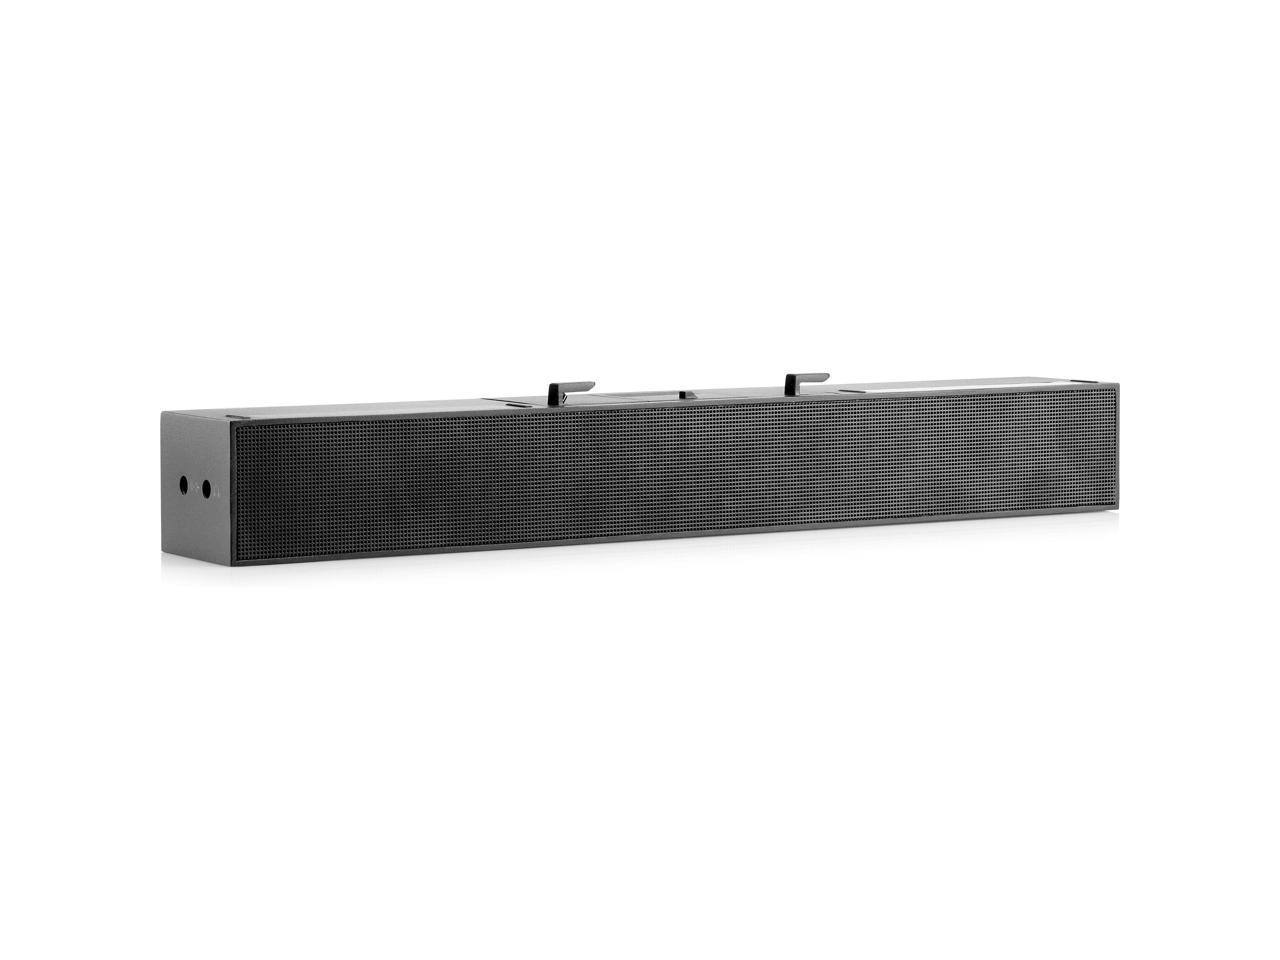 HP S101 Soundbar Speaker